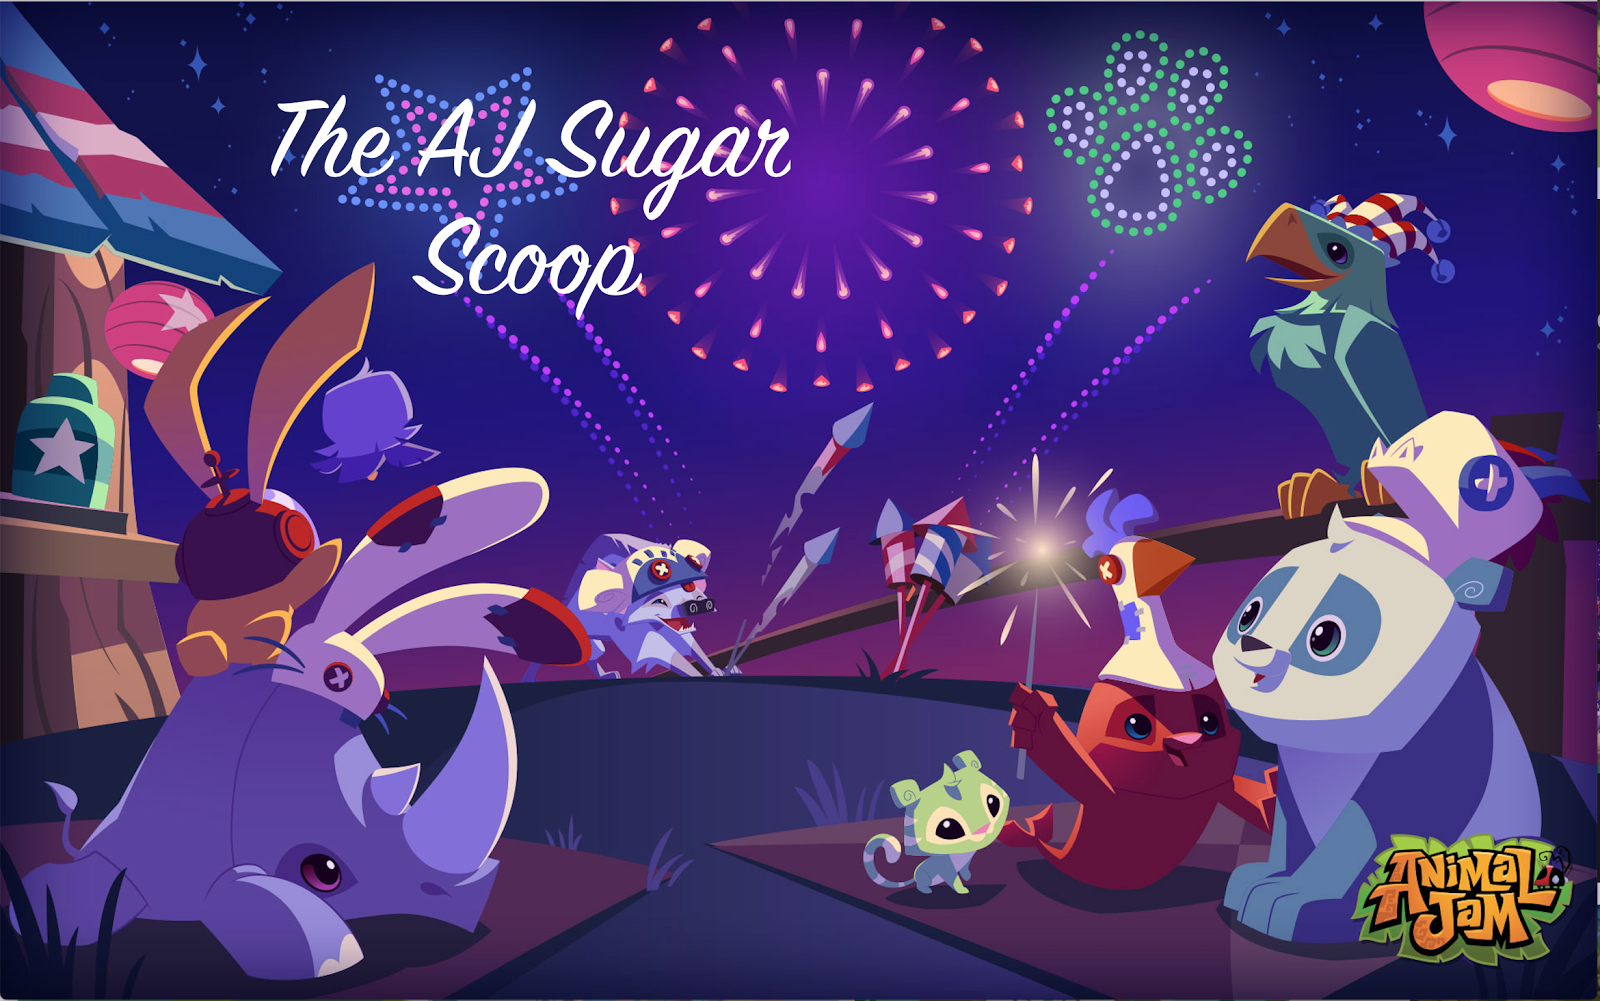 The AJ Sugar Scoop